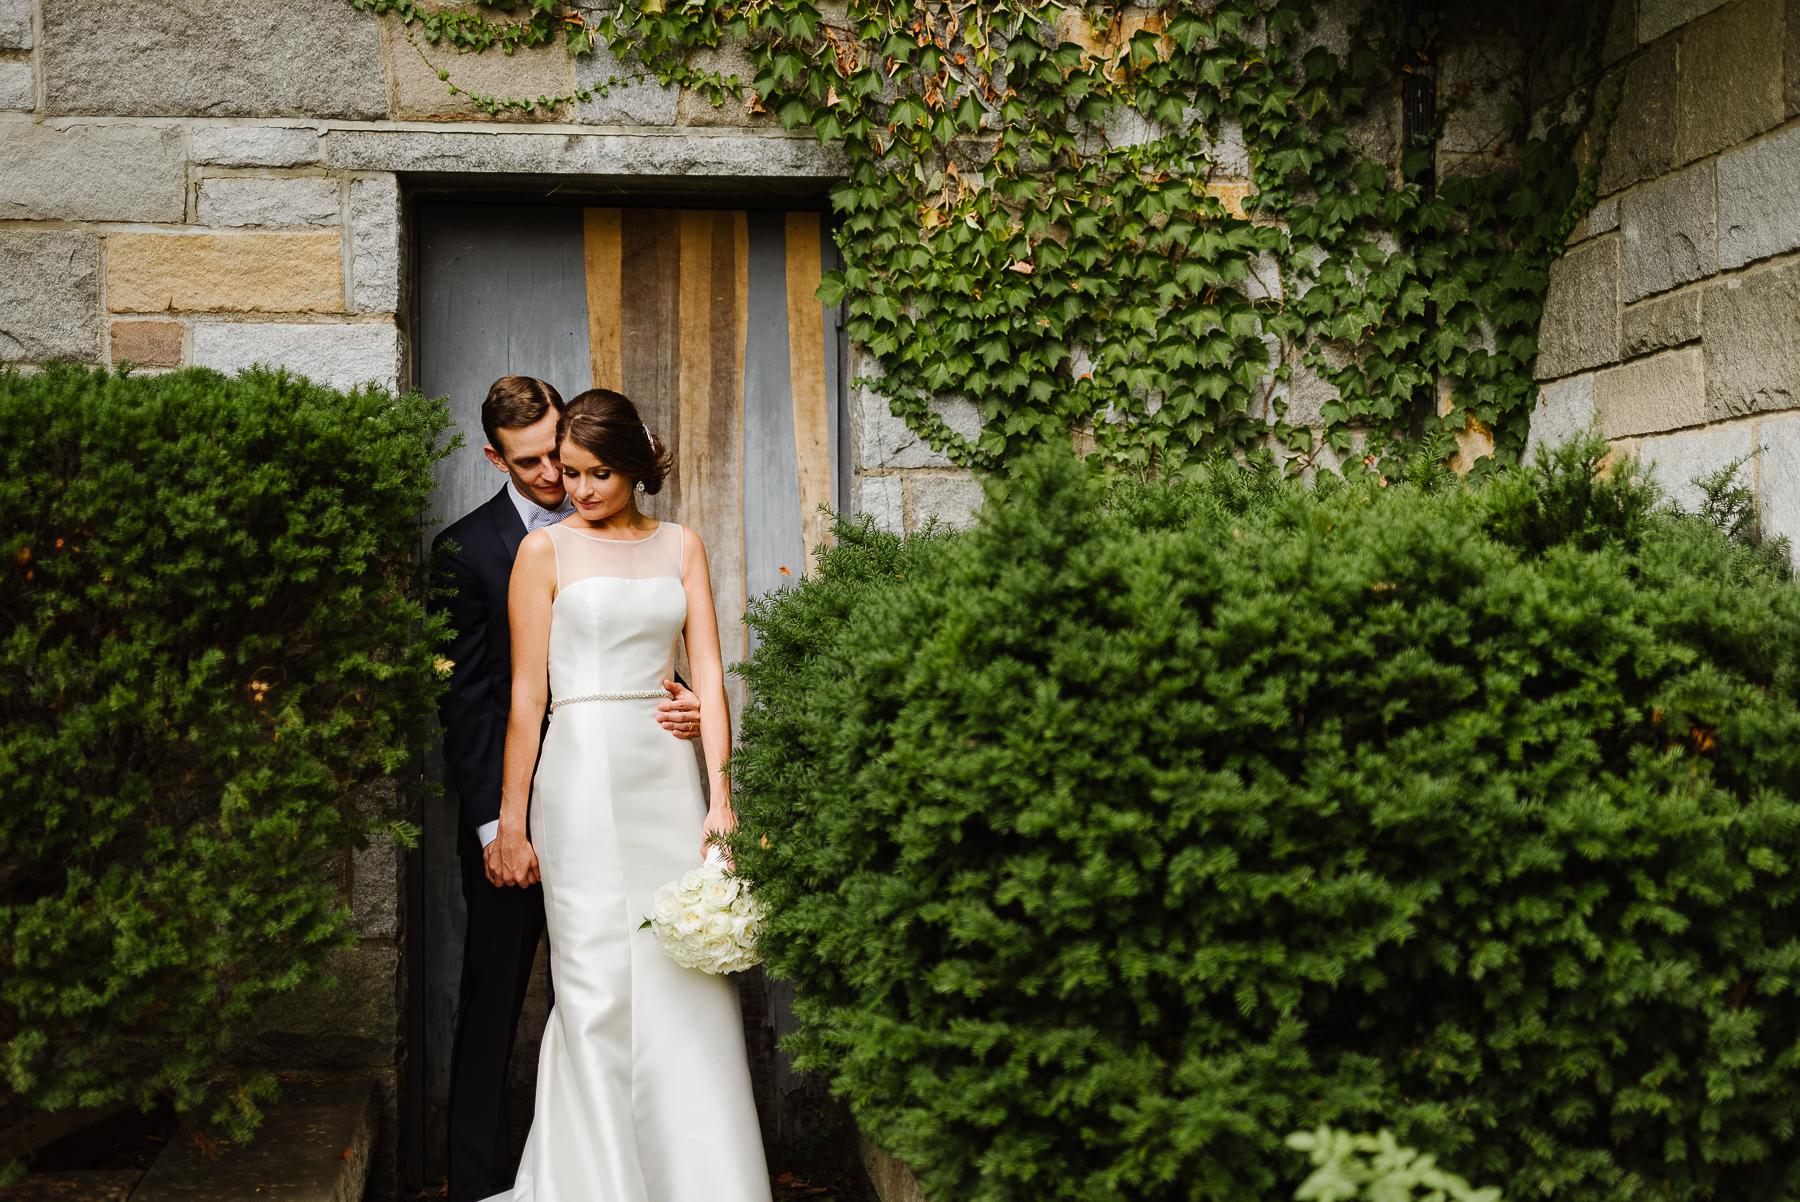 58-J Crew Wedding New Jersey Wedding Photographer J Crew Weddings.jpg